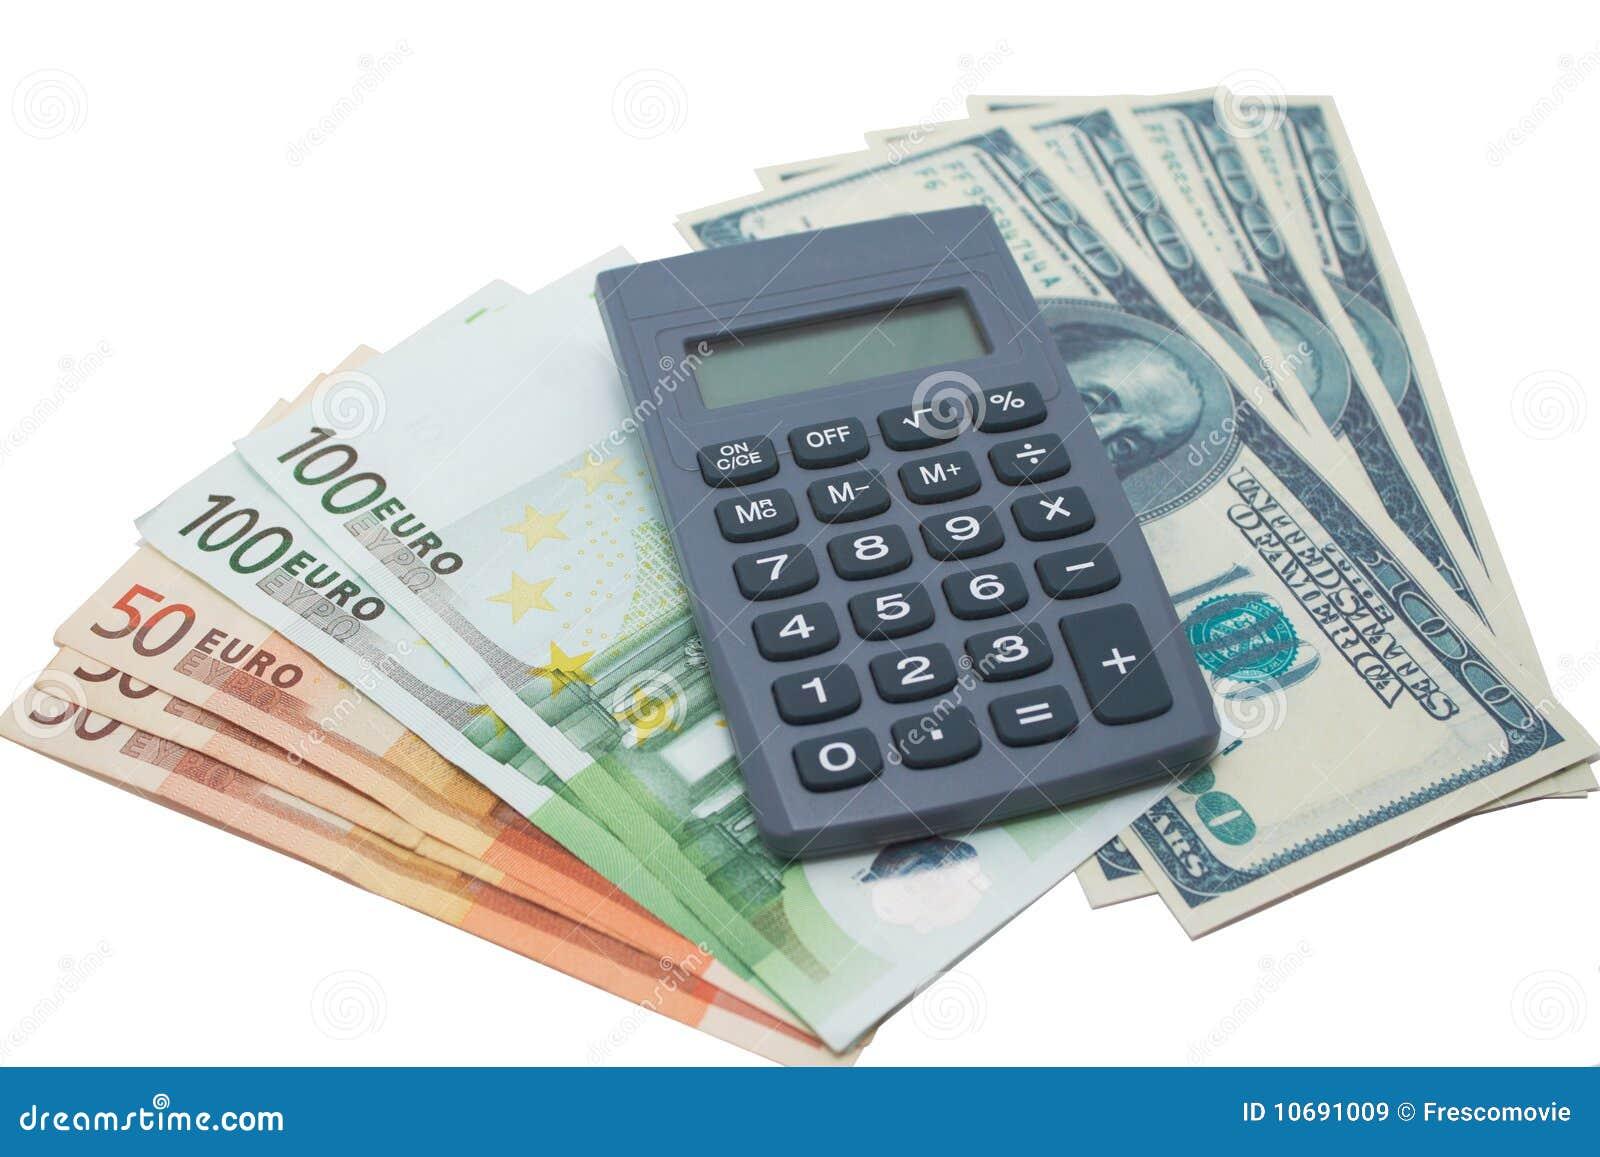 Euro conversion calculator to canadian dollar convert canadian dollar to euro cad to eur currency nvjuhfo Choice Image